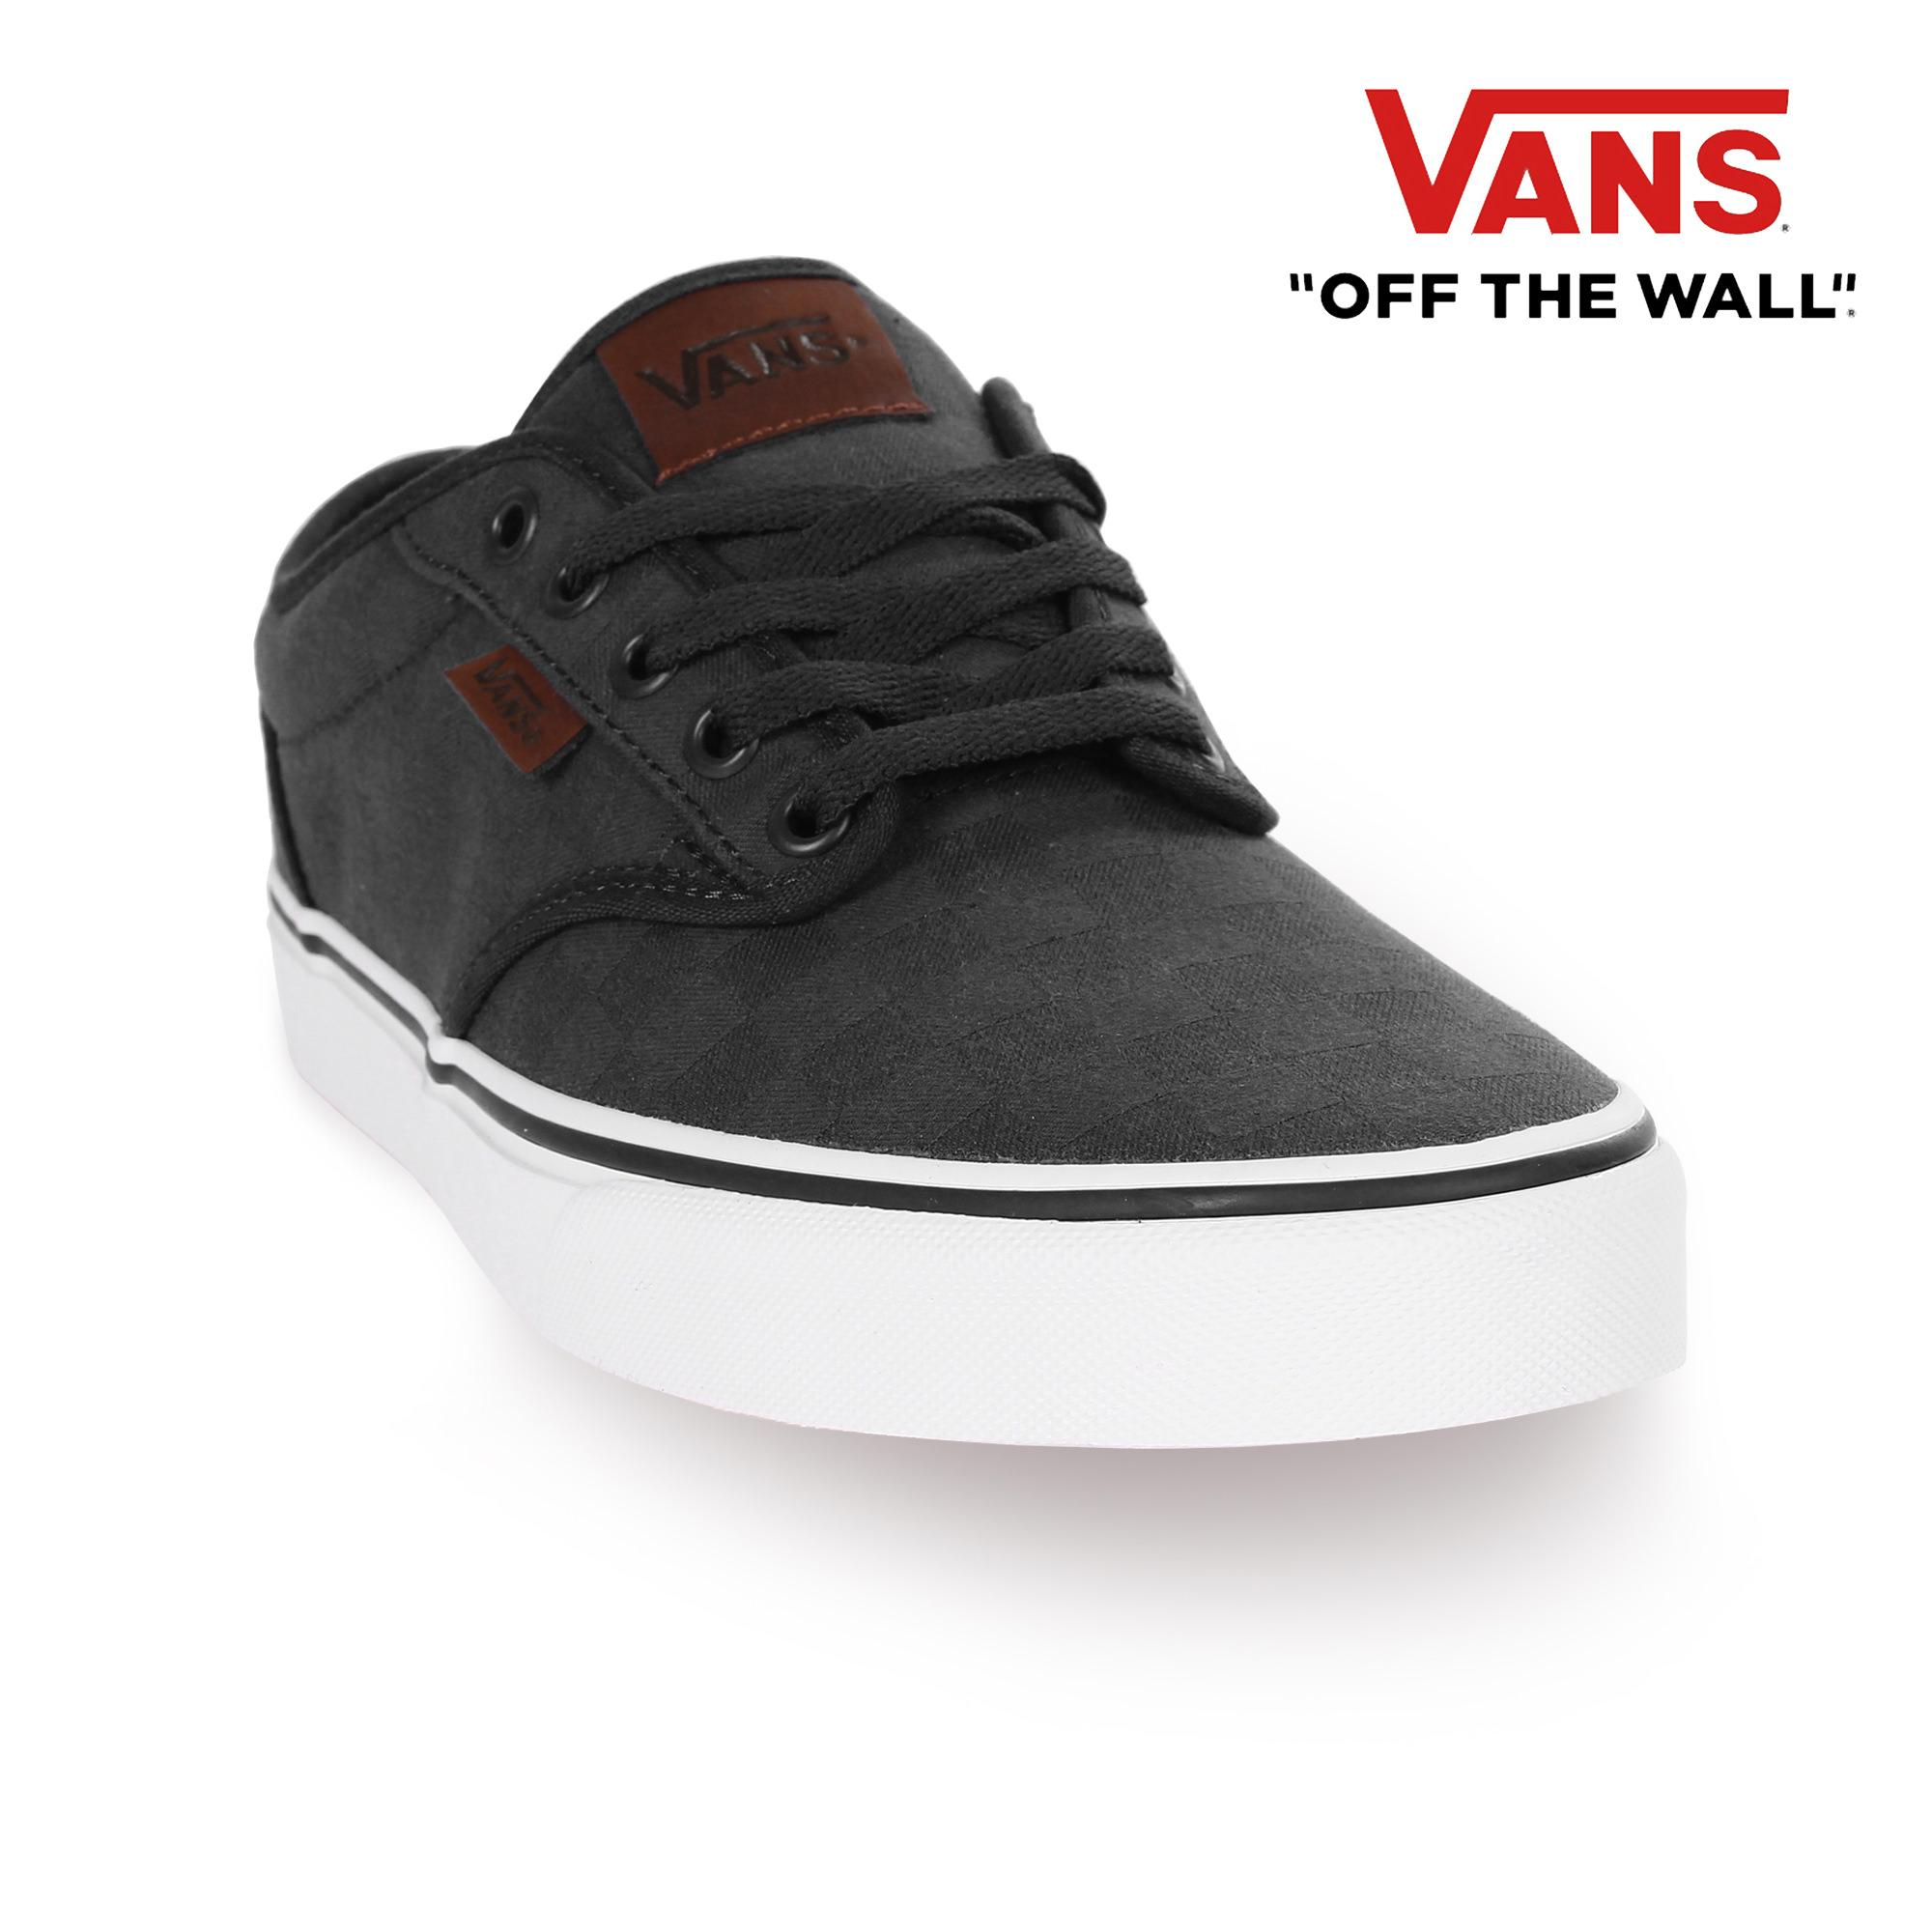 ced57e5f20af86 Vans Shoes for Men Philippines - Vans Men s Shoes for sale - prices ...